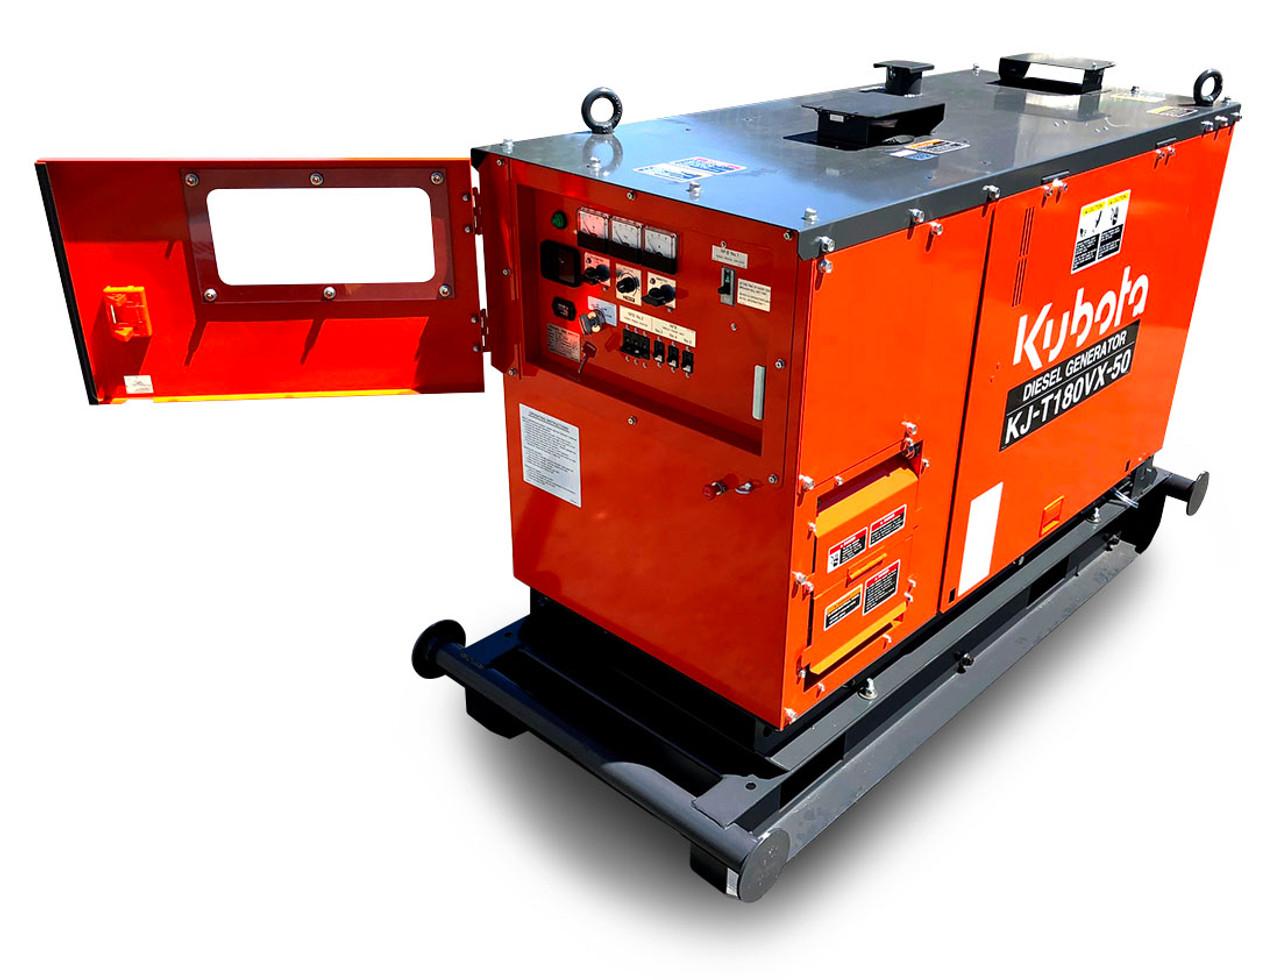 Kubota Generator - 18KVA 3 Phase- KJT180VX